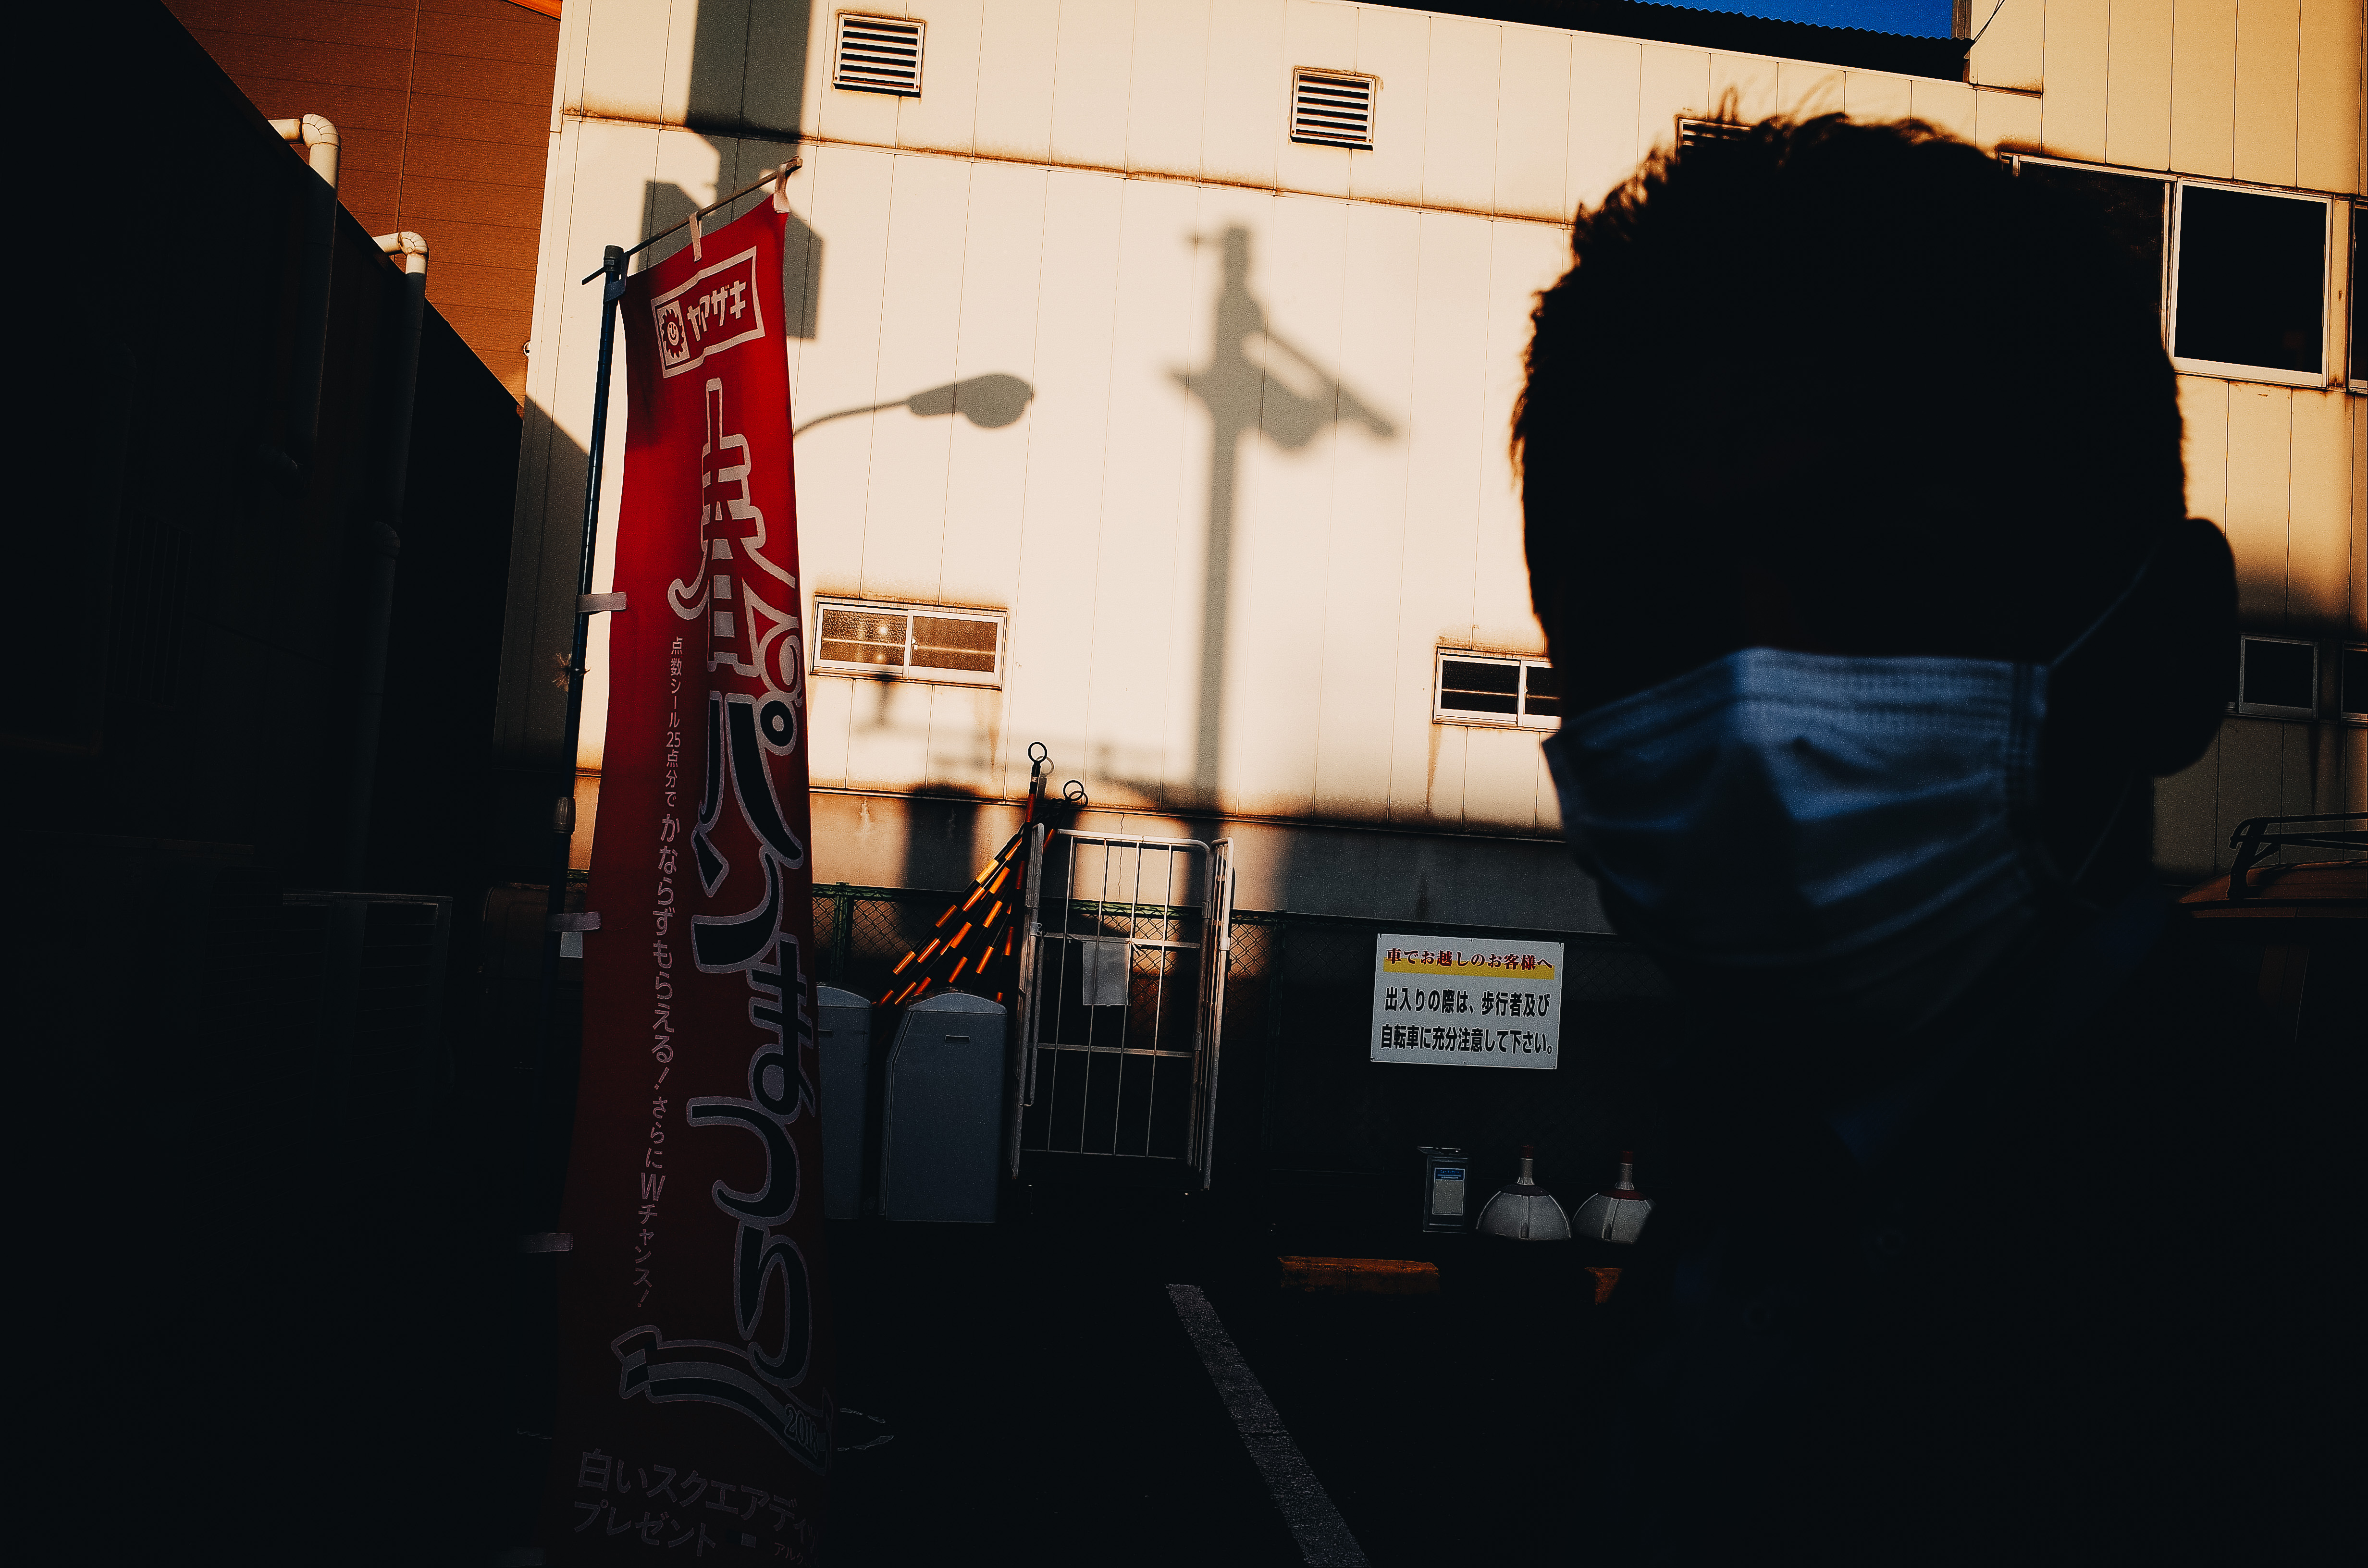 man with mask ricoh sunset light